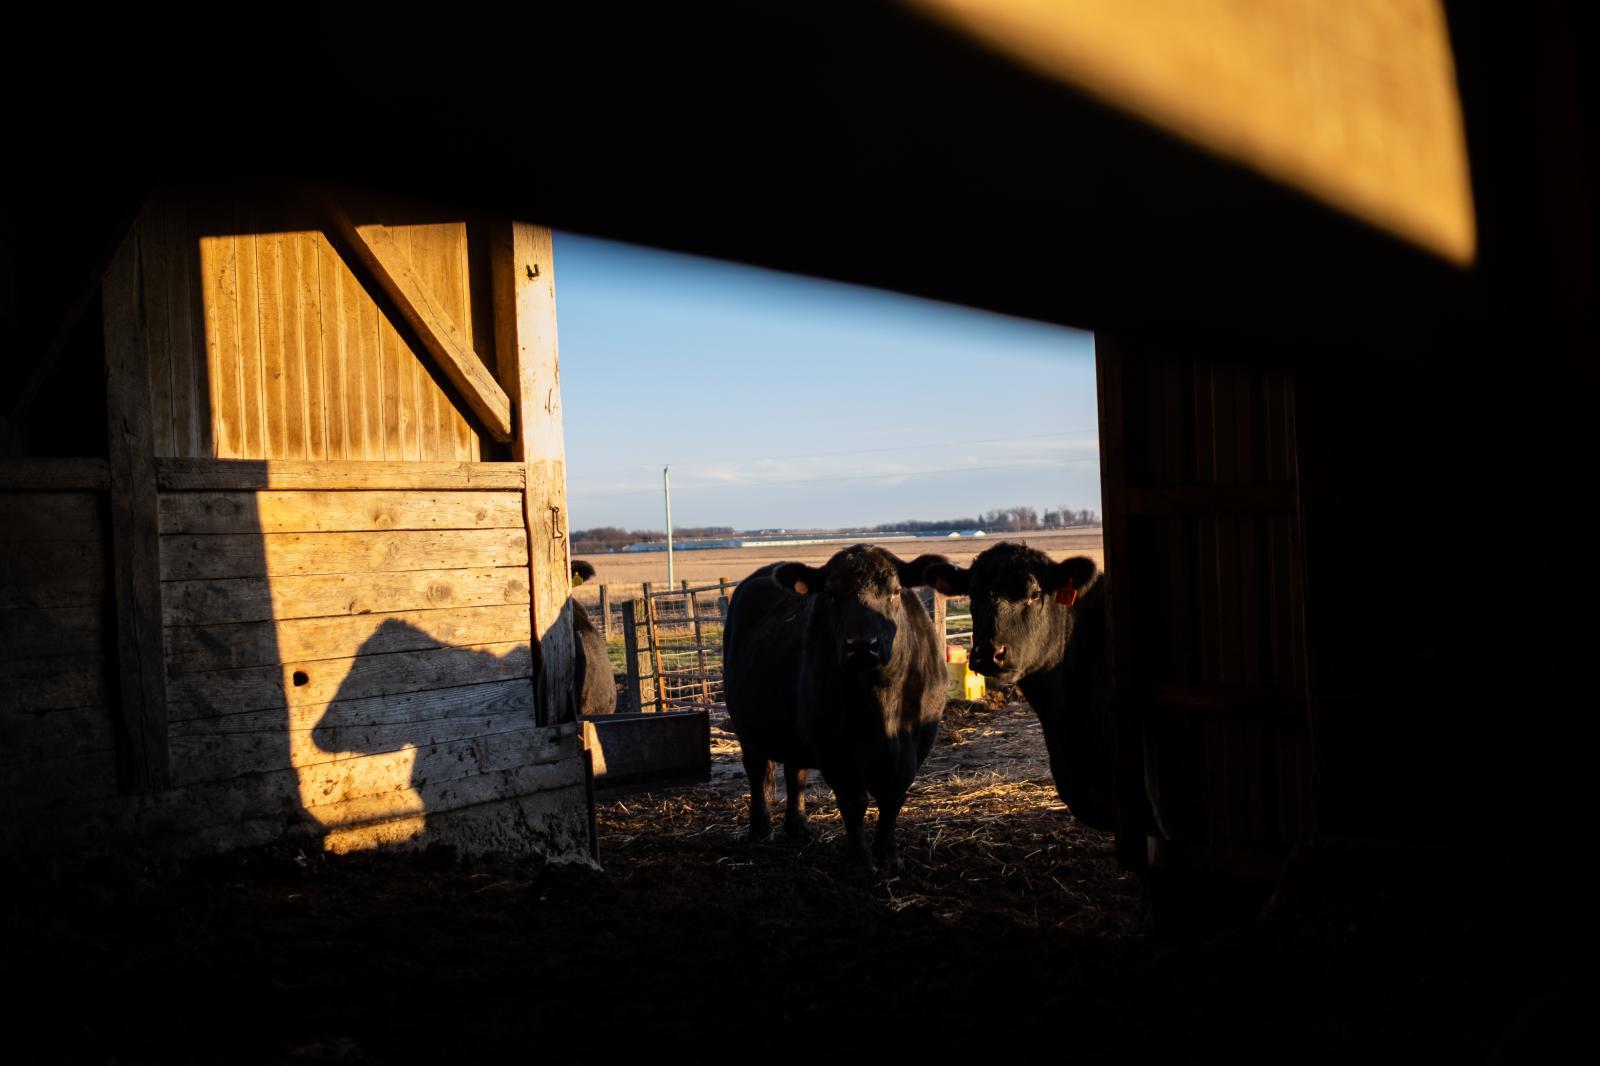 Golden hour on my family's farm in Schaller, Iowa.